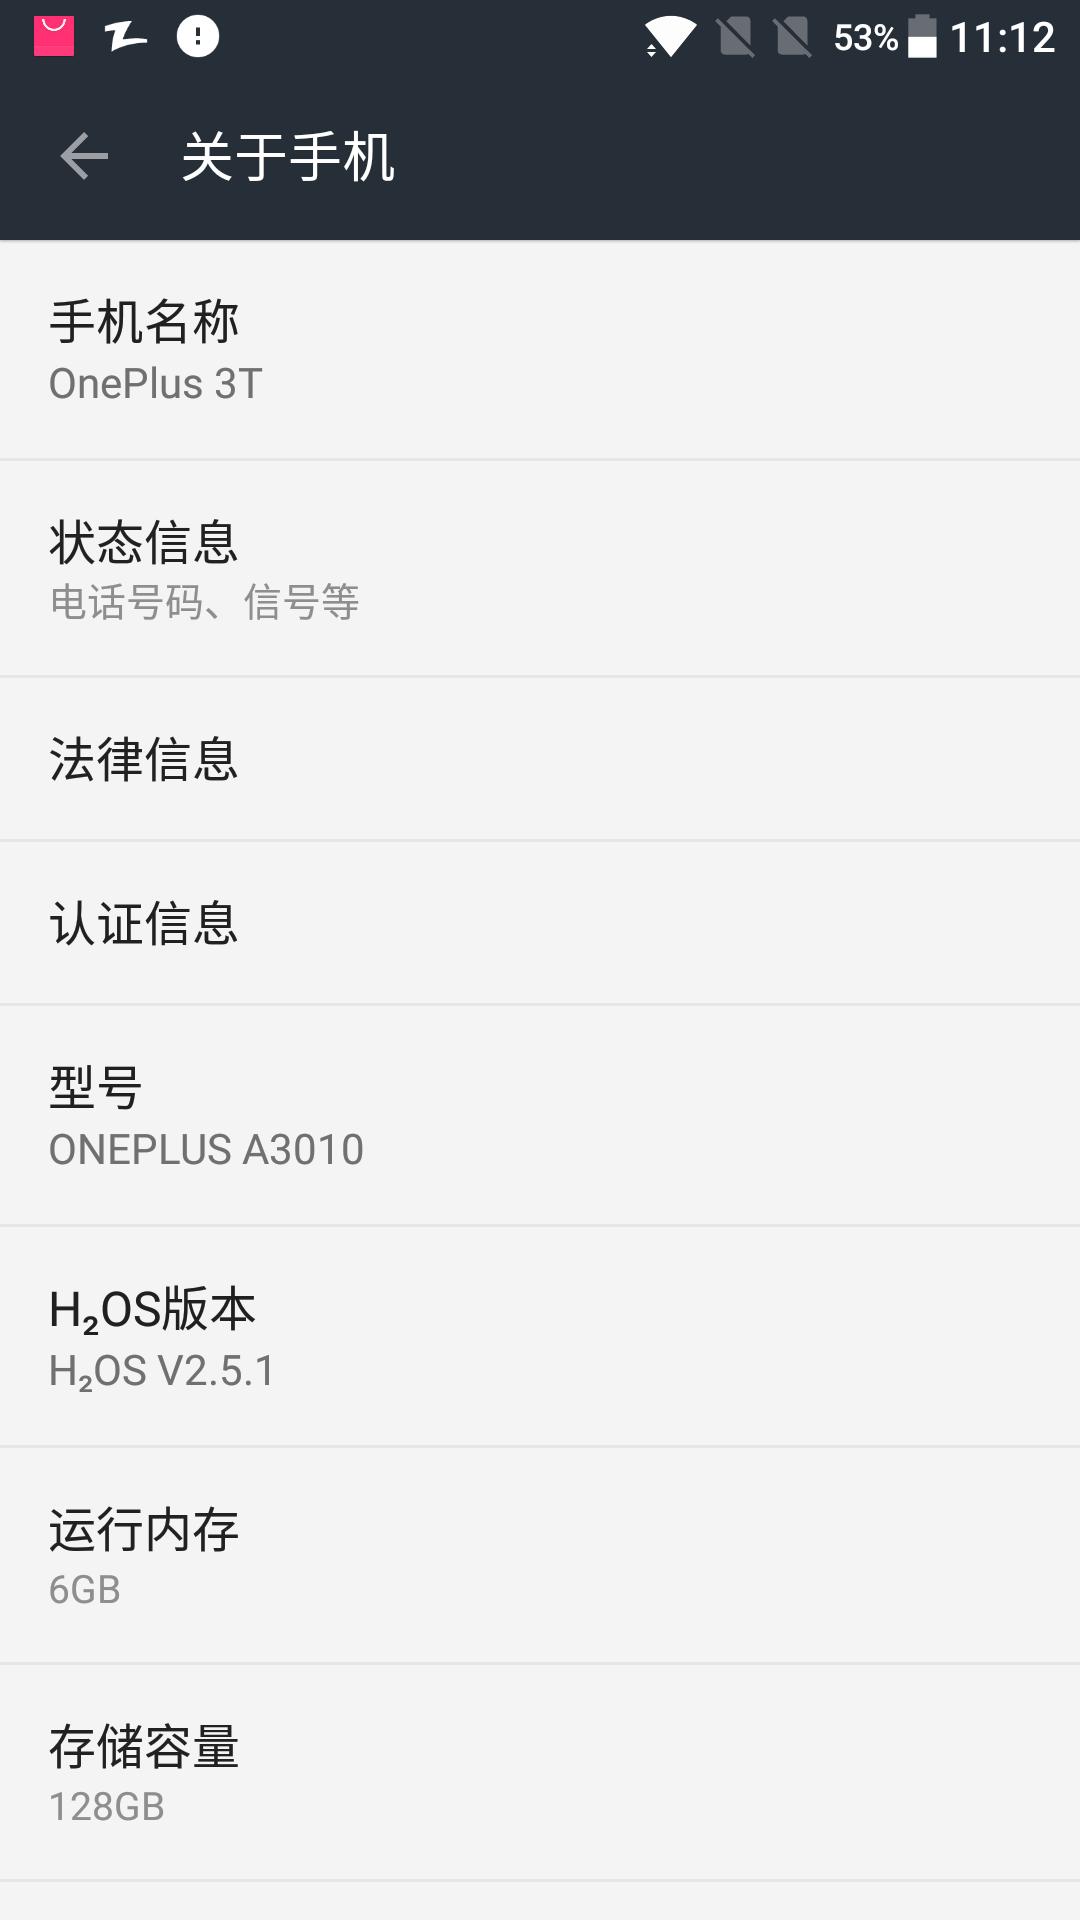 Screenshot_20170112-111203.png